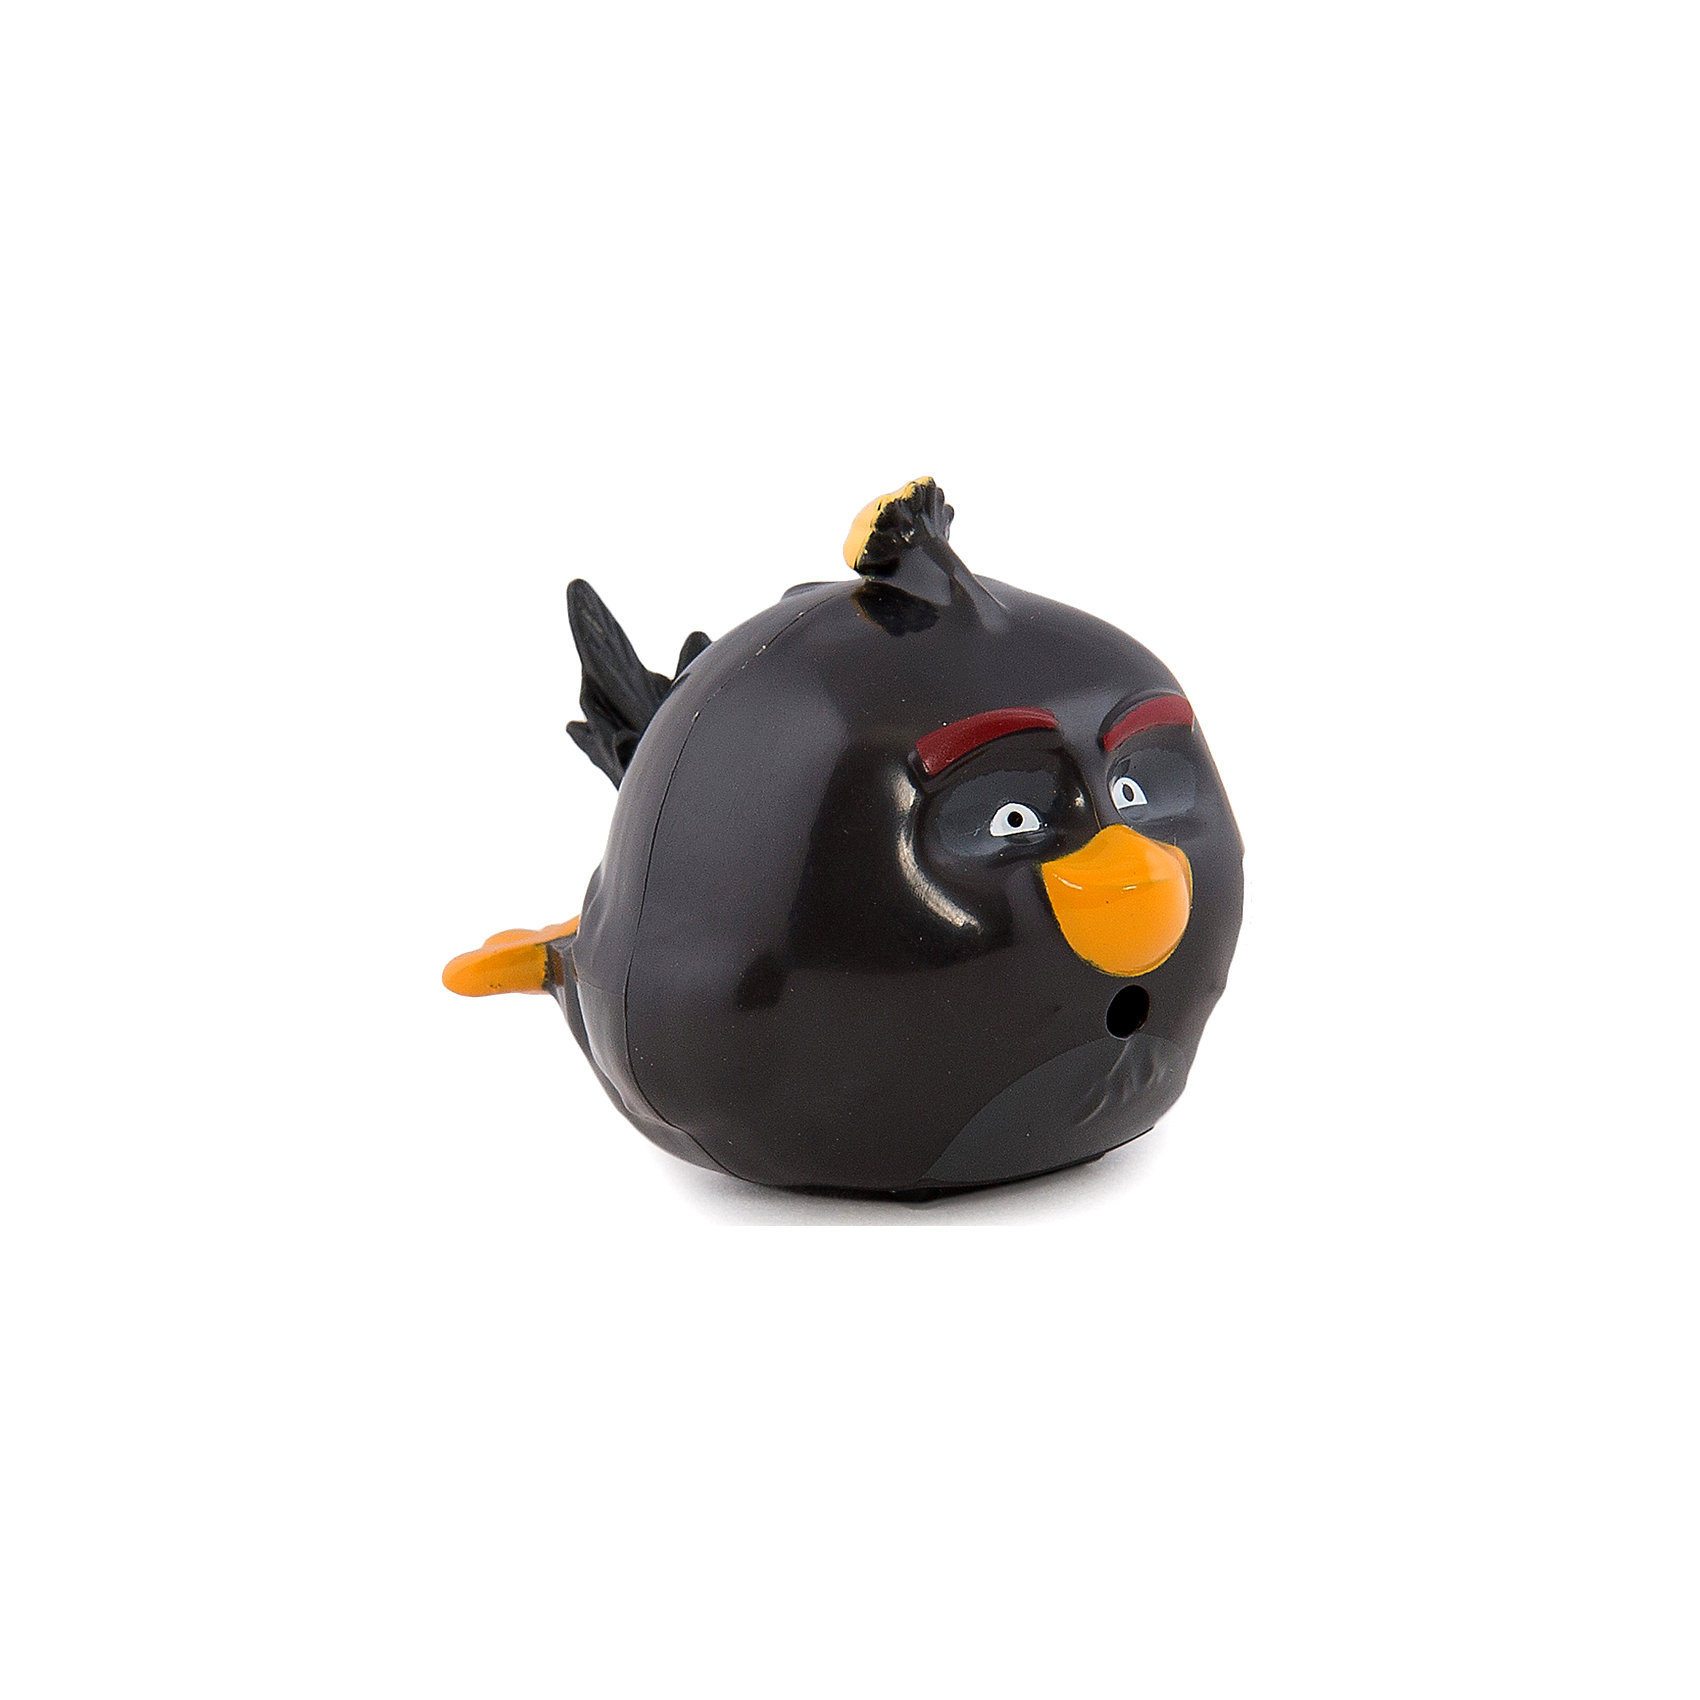 Spin Master Птичка на колесиках Бомб, Angry Birds bimast bomb premium купить челябинск